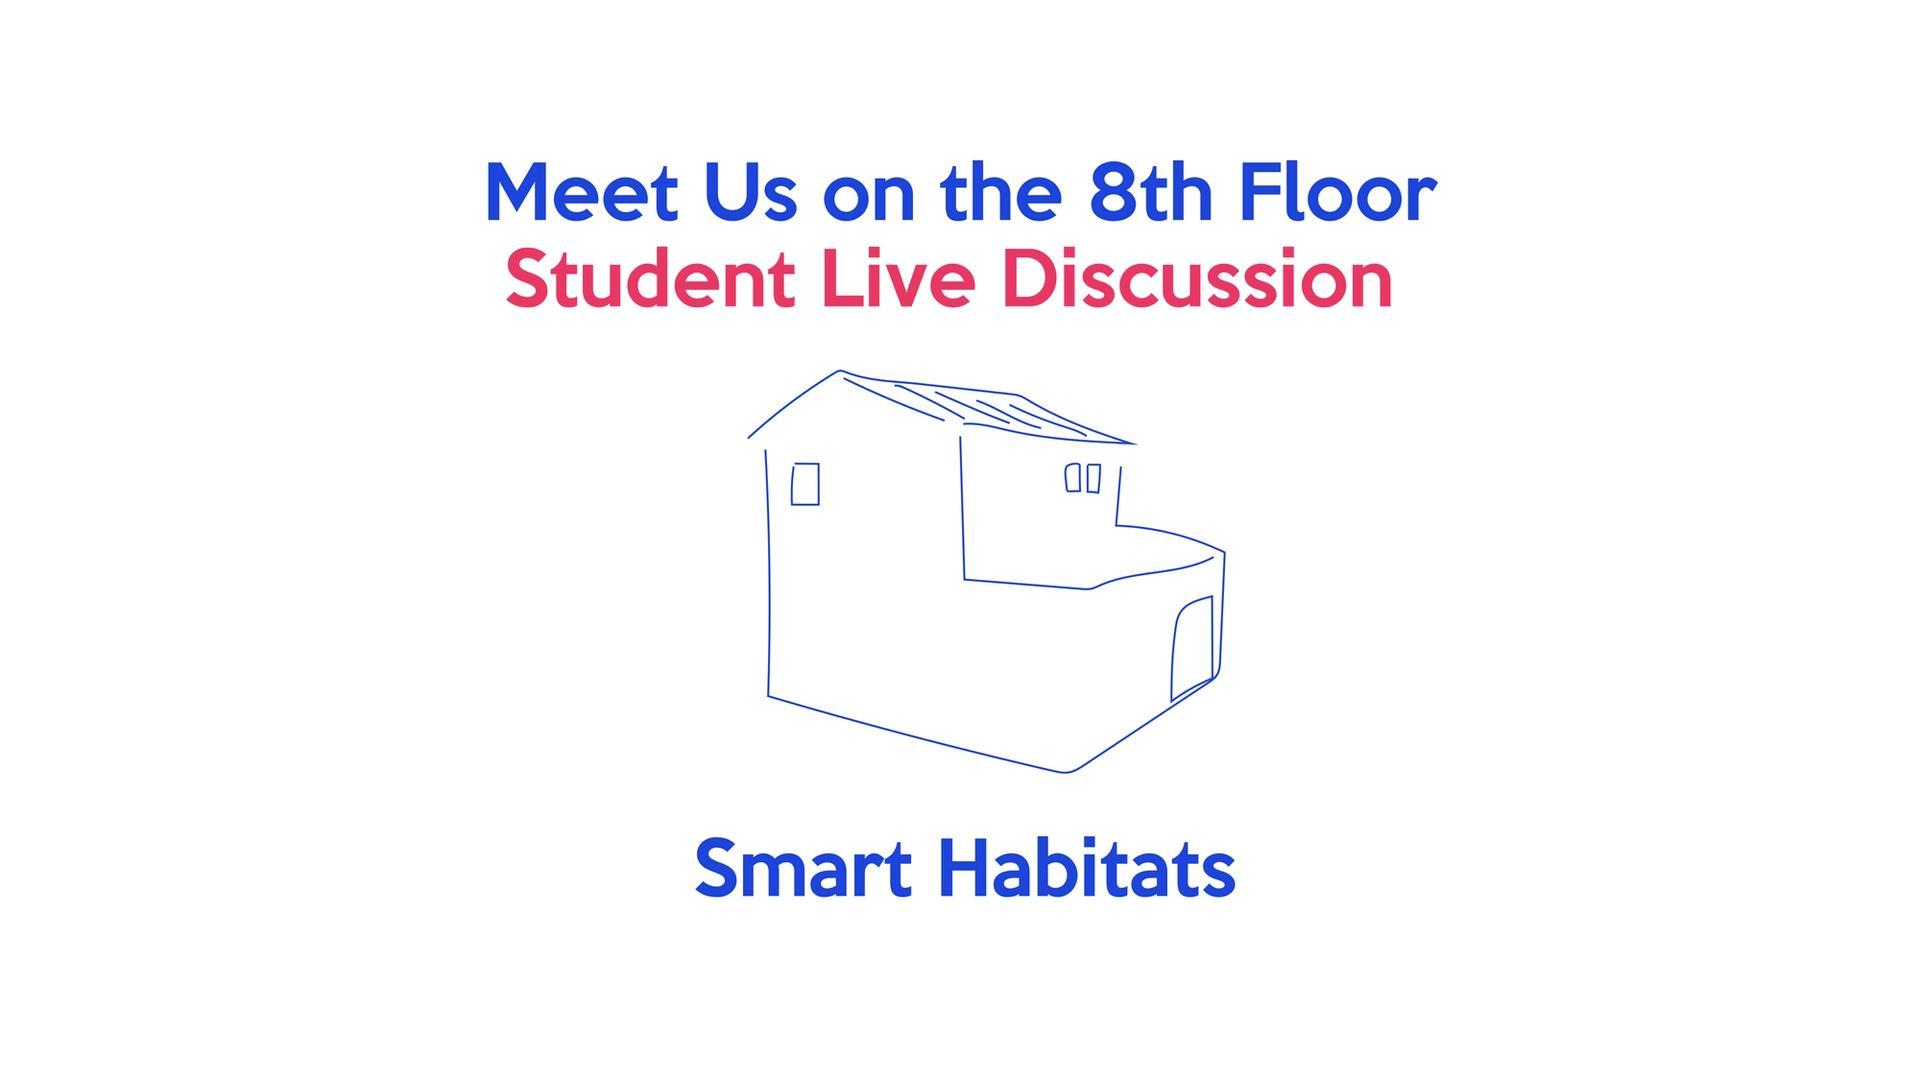 Meet Us on the 8th Floor: Smart Habitats